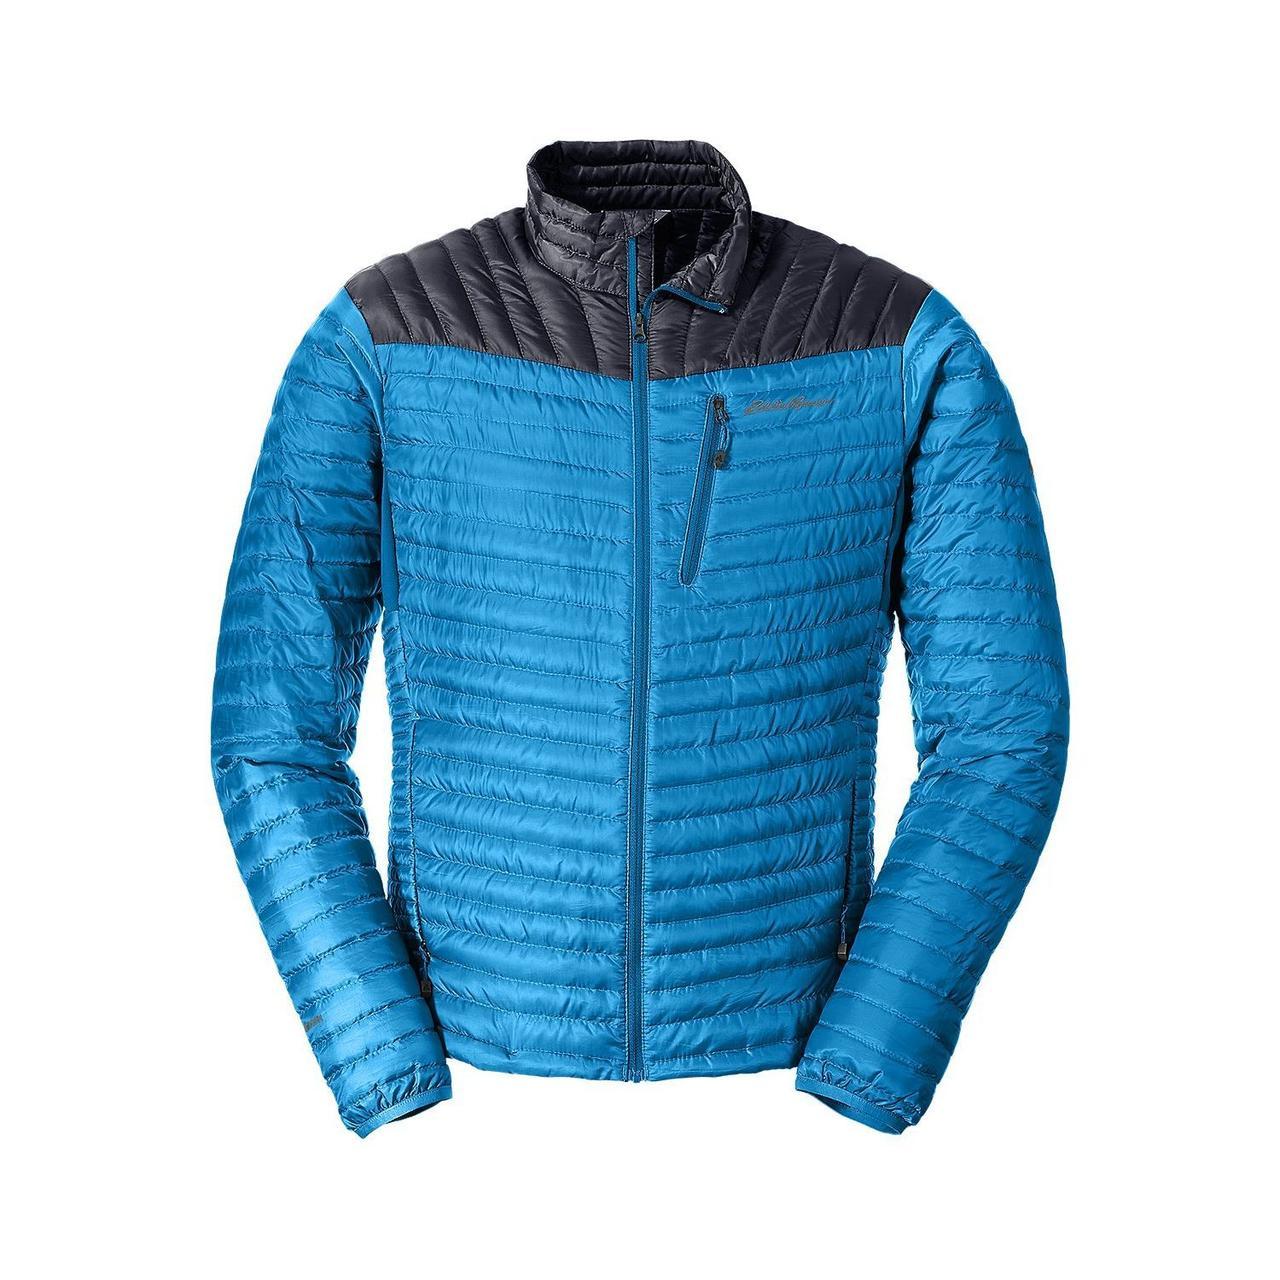 5232c8cfed8ad Куртка Eddie Bauer Mens MicroTherm StormDown Jacket L Голубой 0848WV-L,  КОД: 305215, цена 5 770,99 грн., купить в Киеве — Prom.ua (ID#853509377)